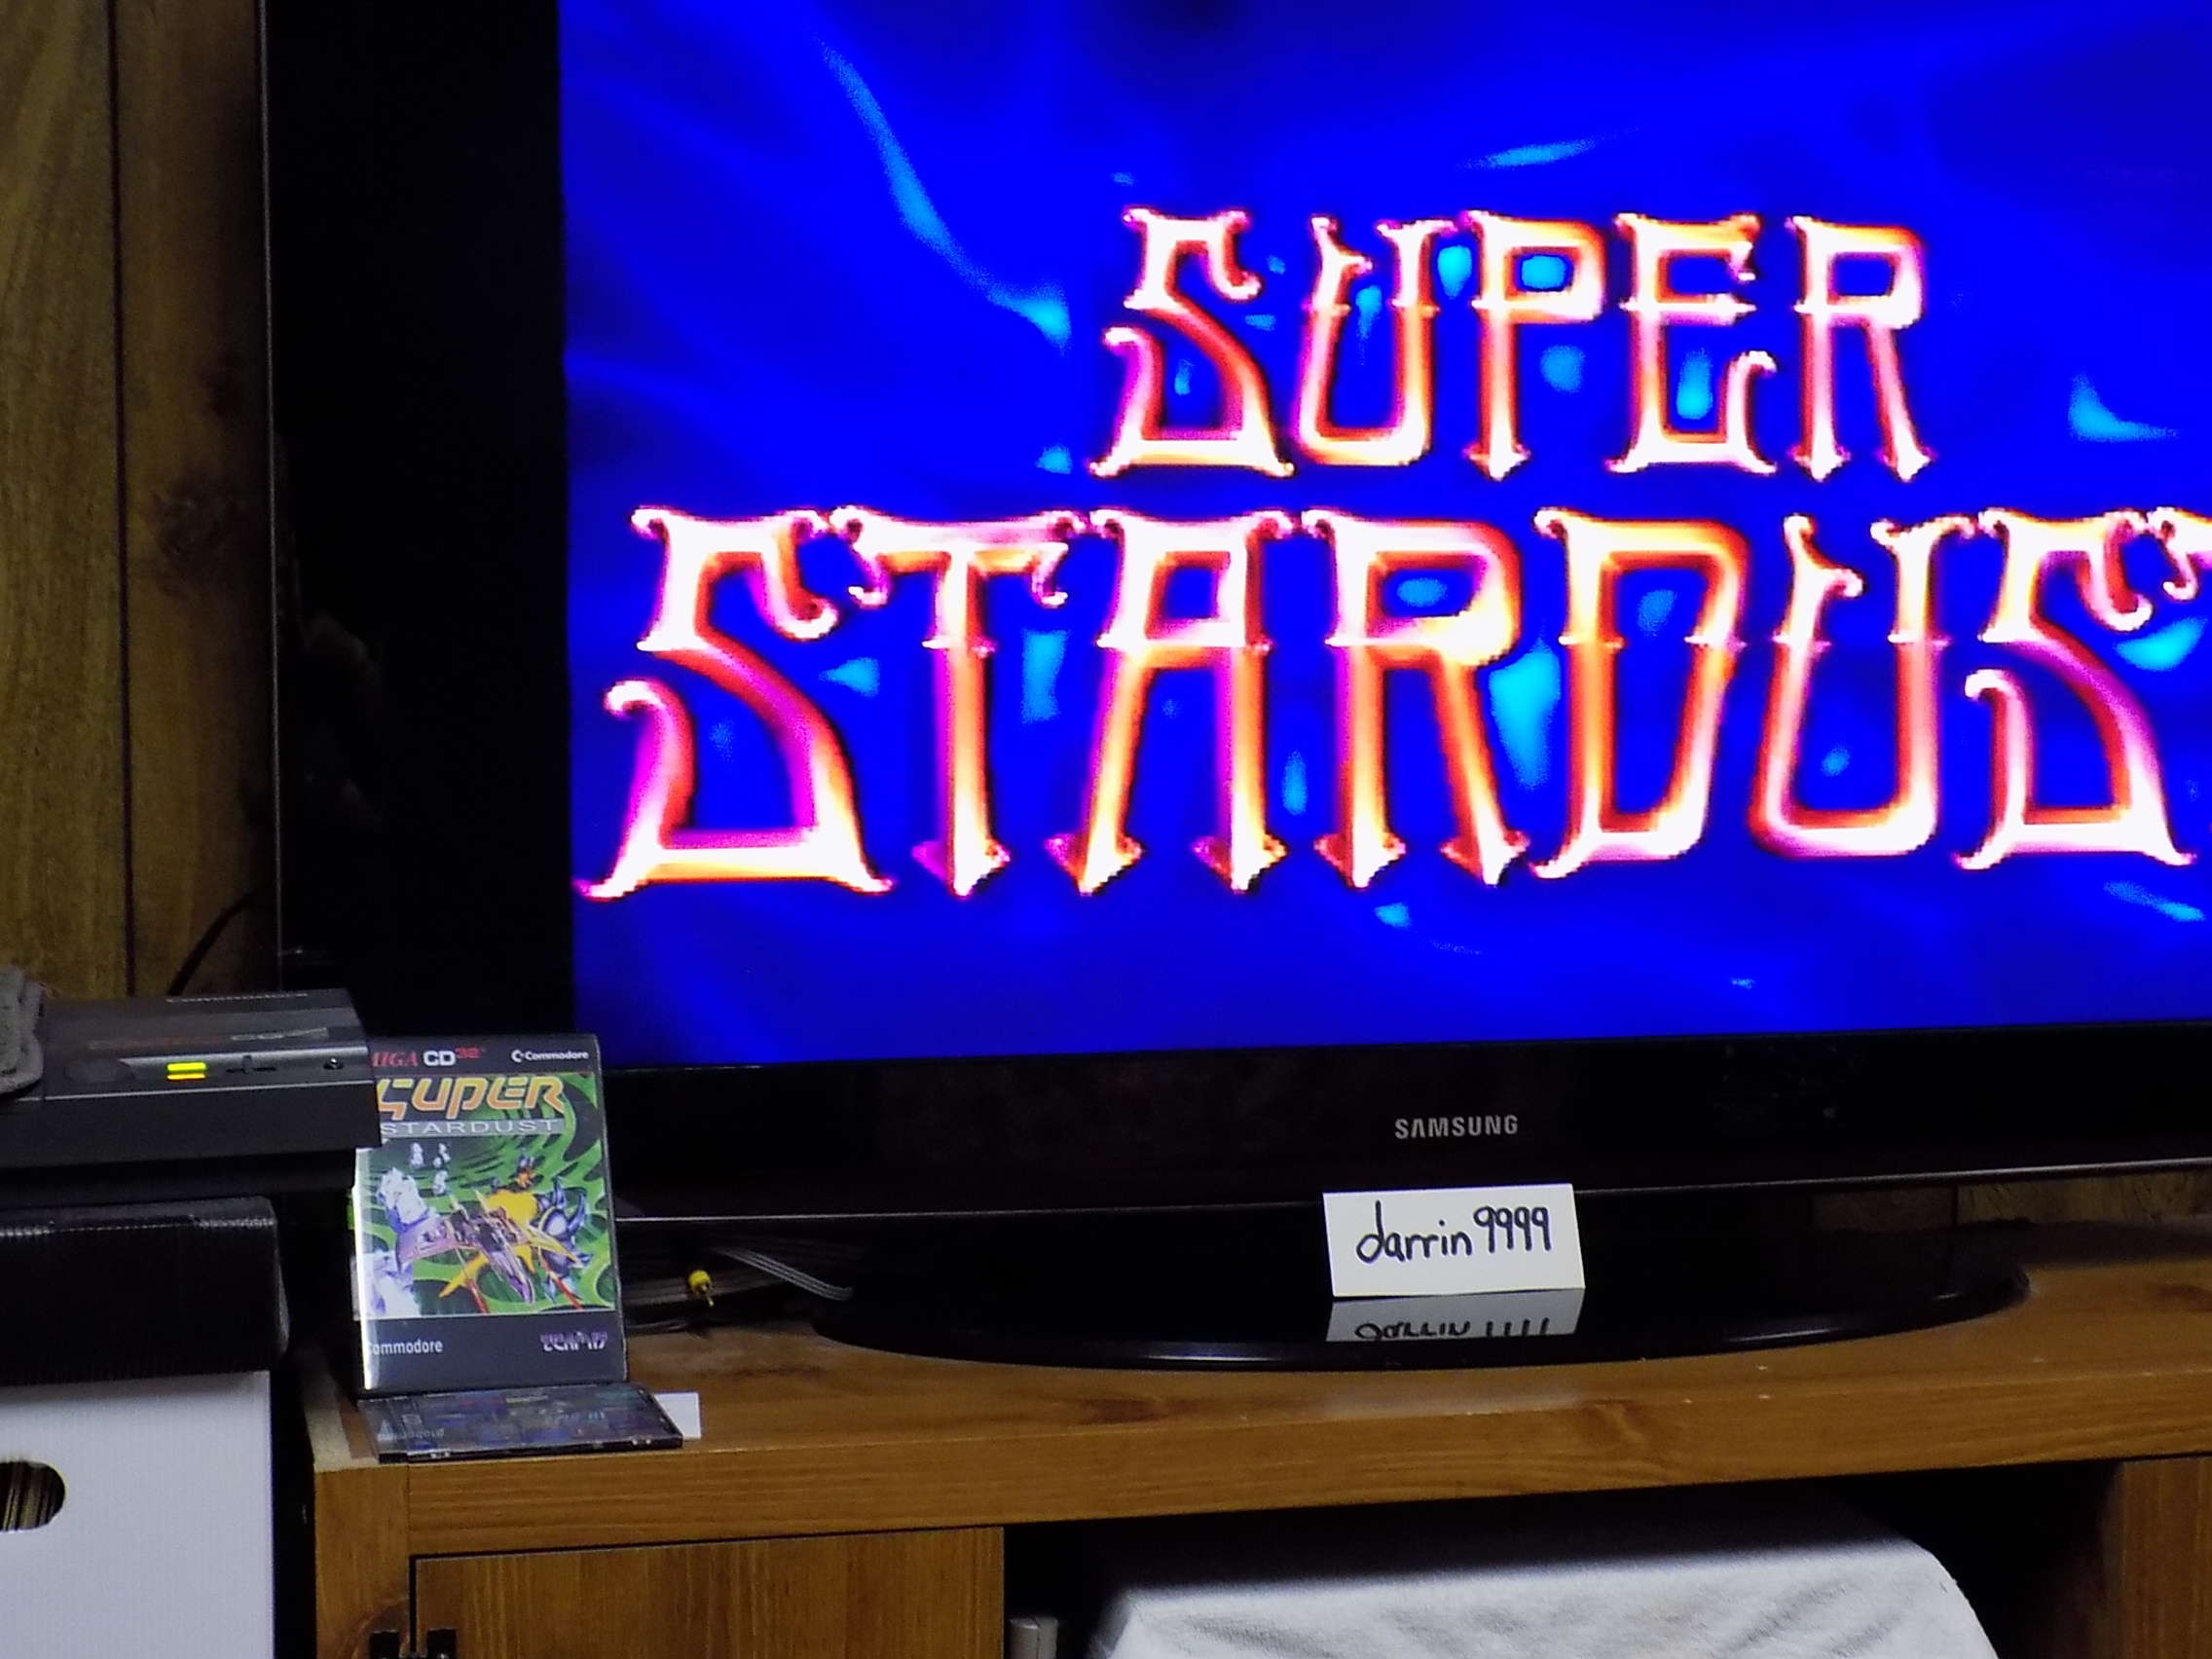 darrin9999: Super Stardust [3 Lives Start] (Amiga) 116,100 points on 2019-10-27 08:16:54